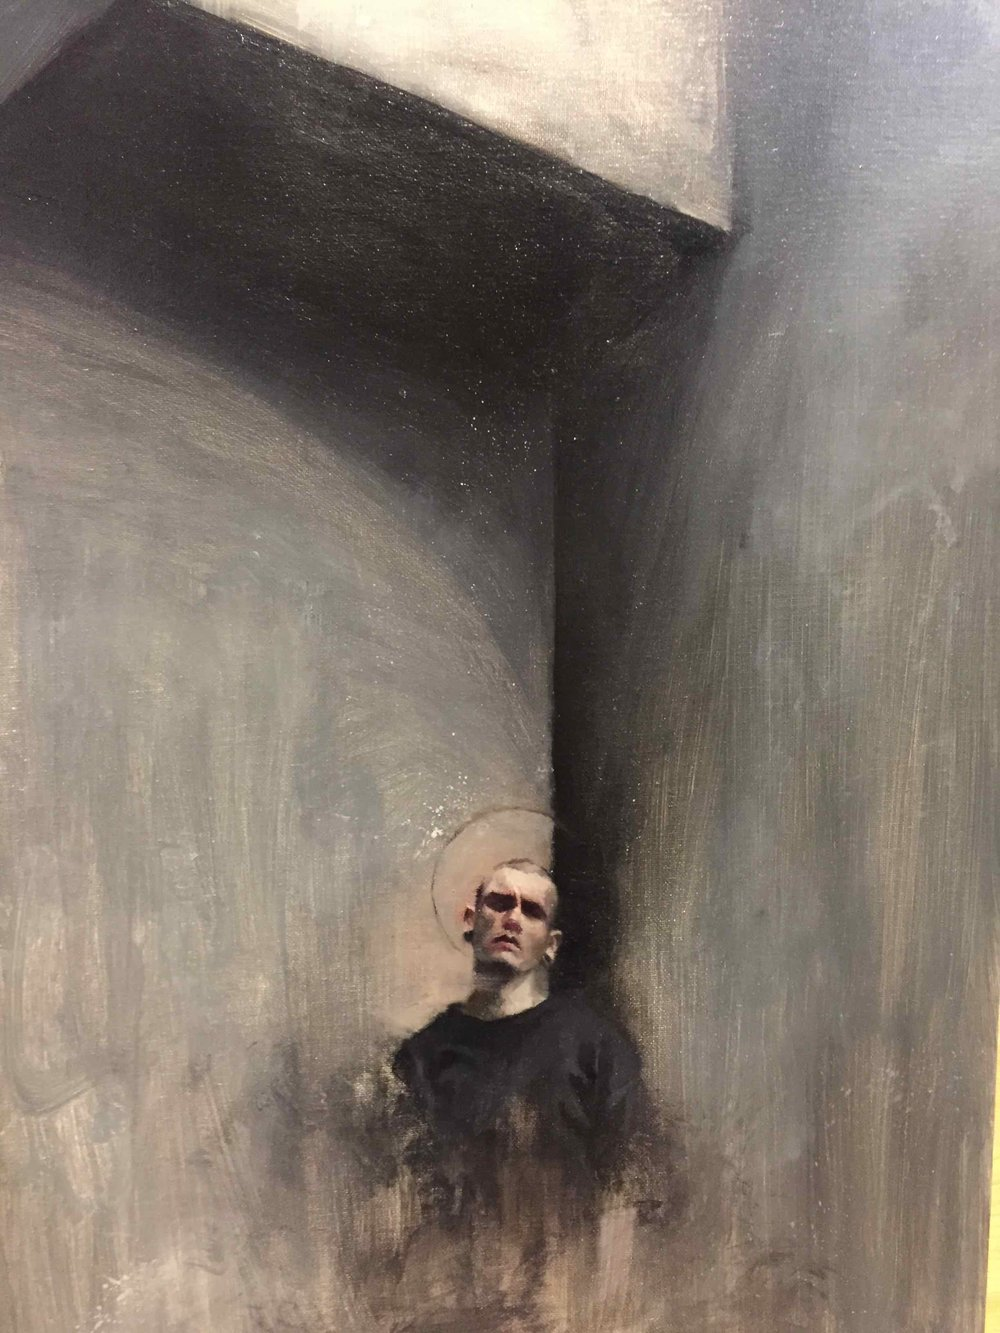 Chris Valentine  'Ghost II'  Oil on panel  59.5 x 42 cm